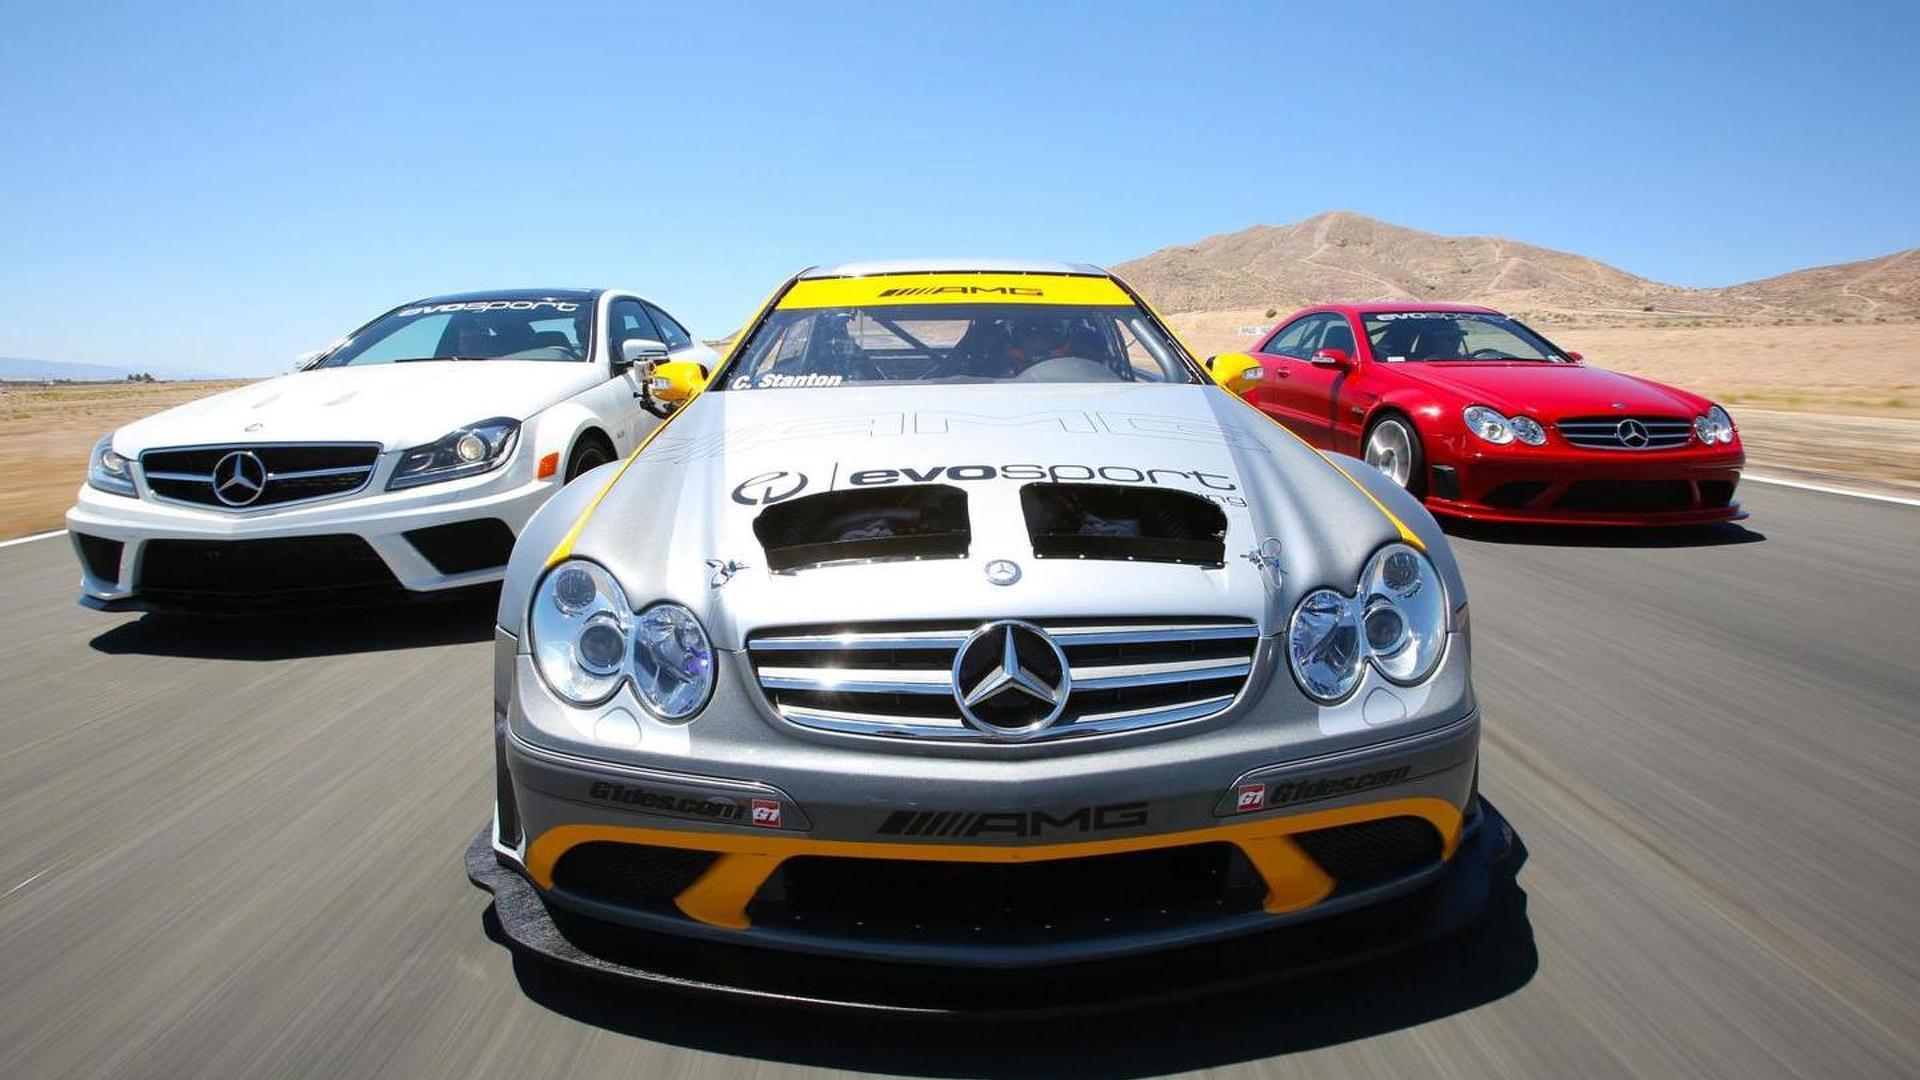 MBBS-Evosport Mercedes CLK 63 AMG Black Series race car revealed